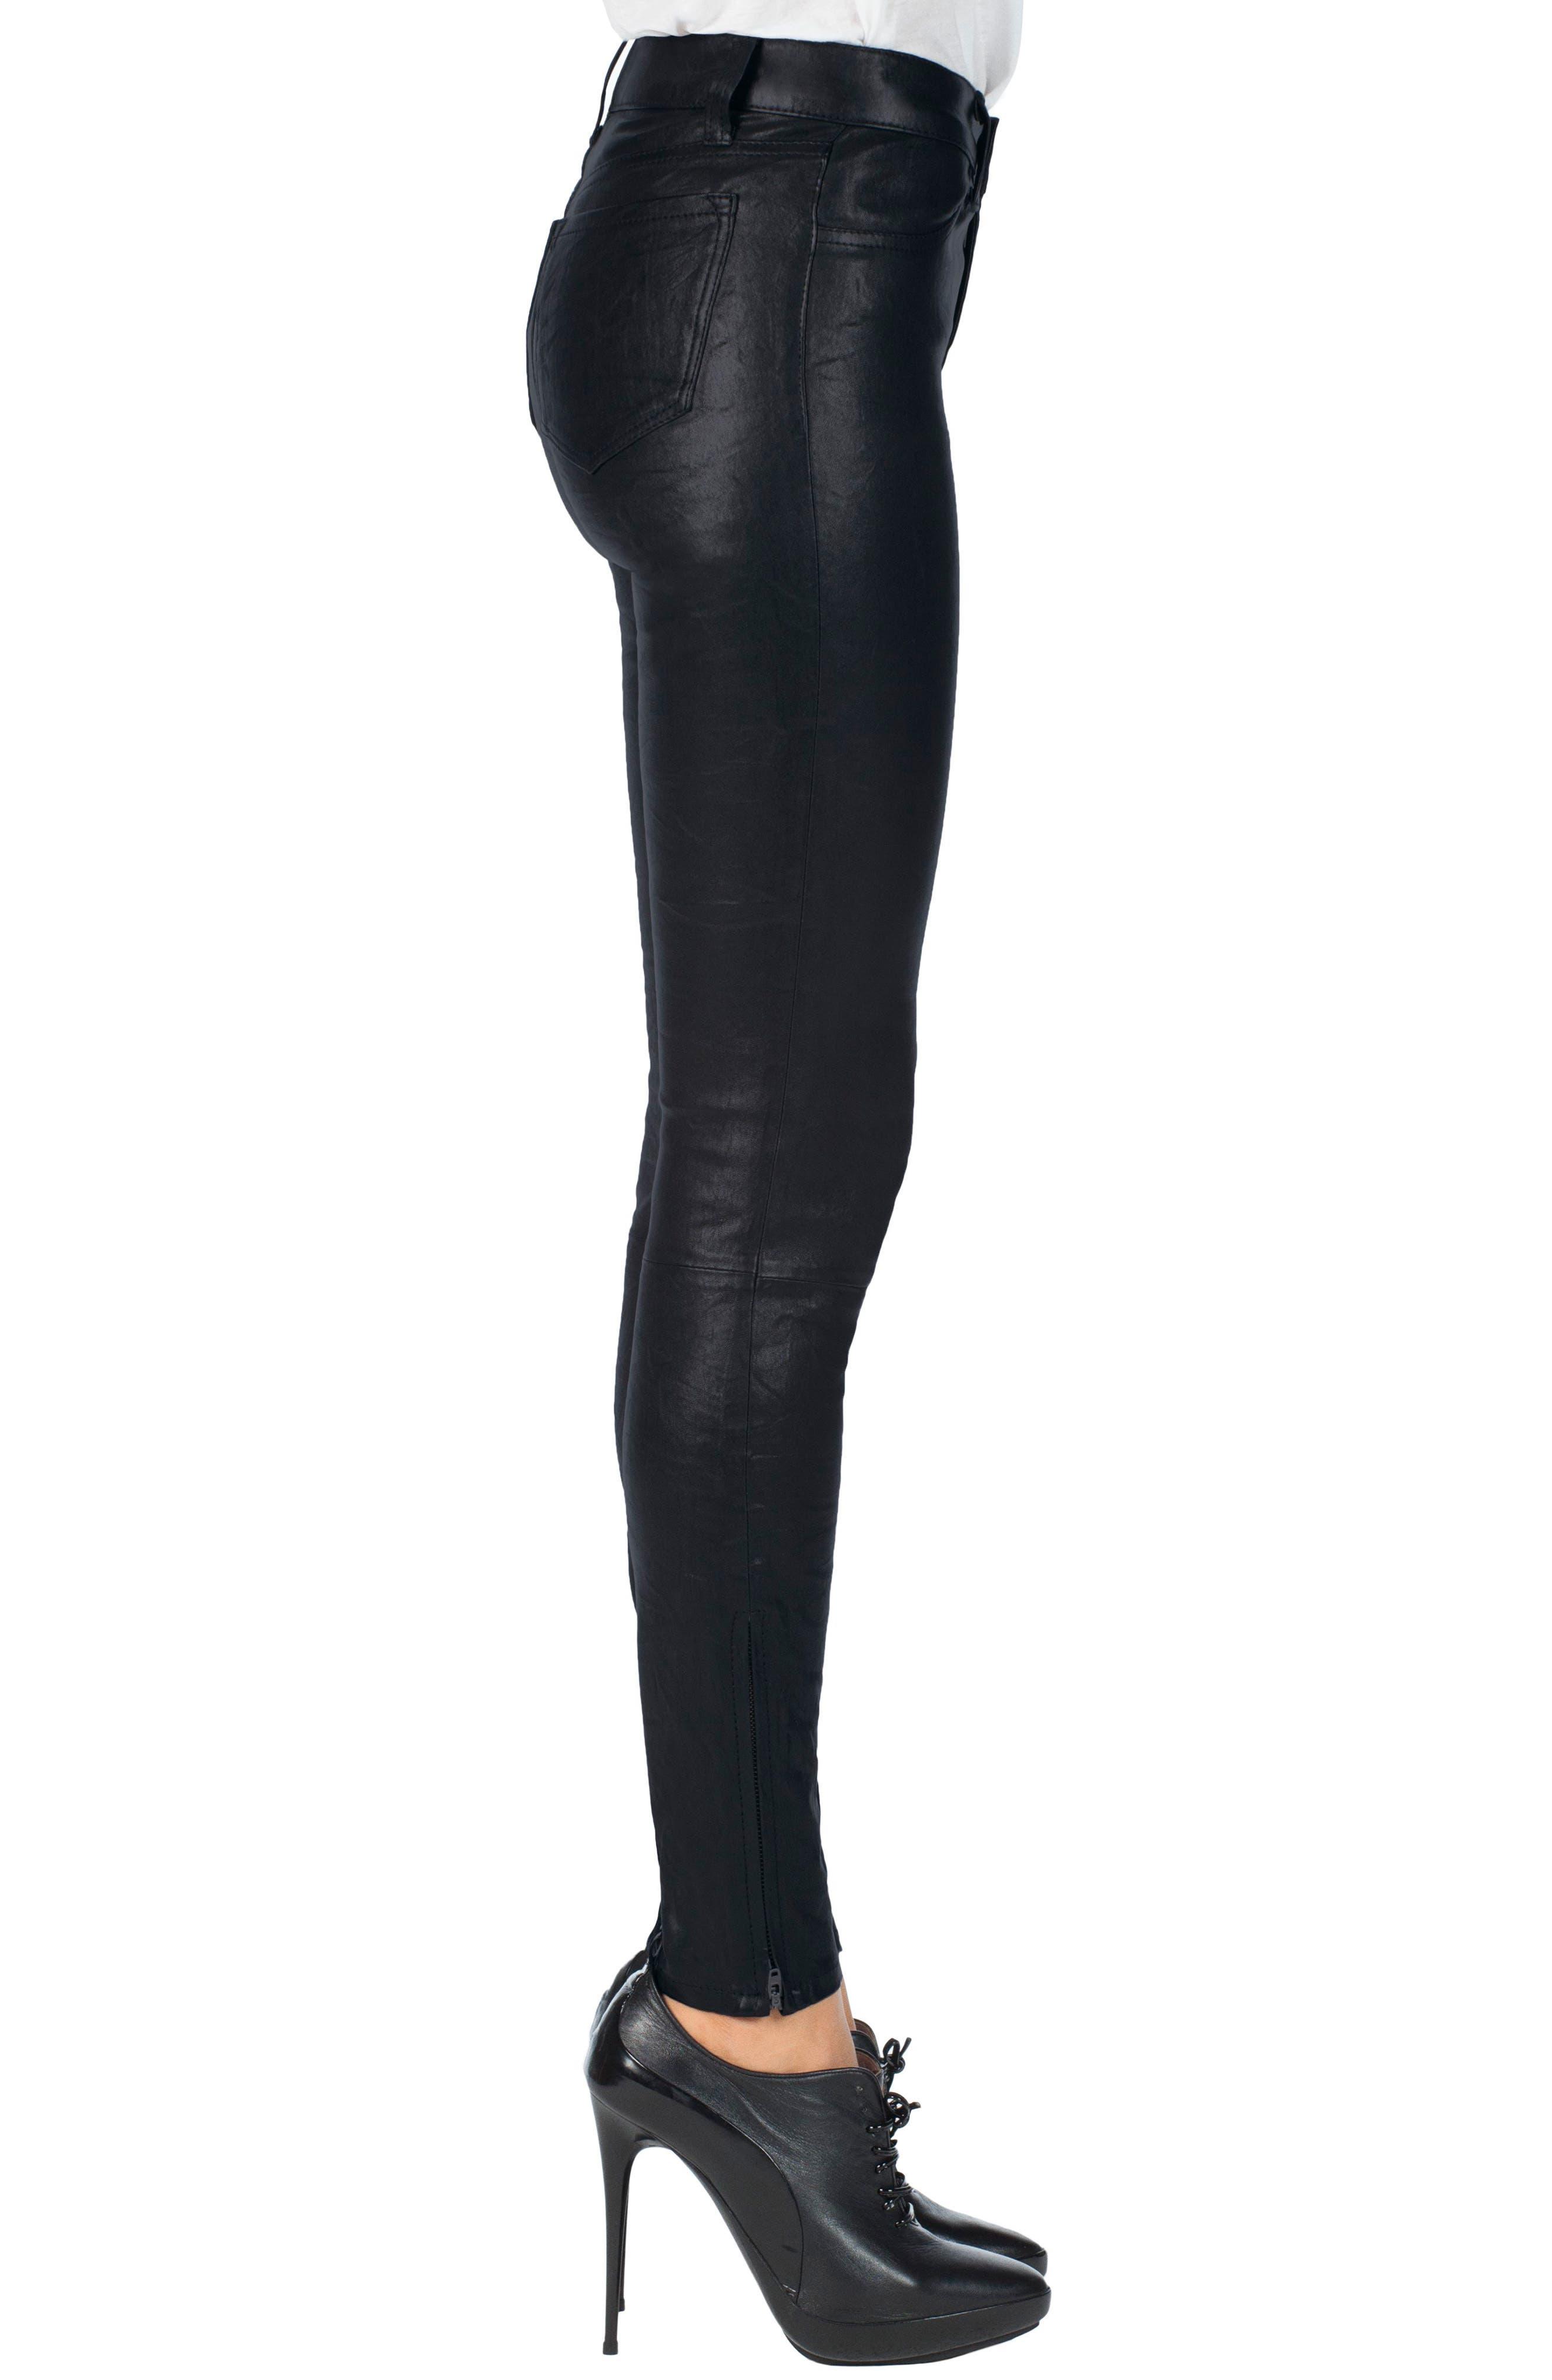 '8001' Lambskin Leather Pants,                             Alternate thumbnail 58, color,